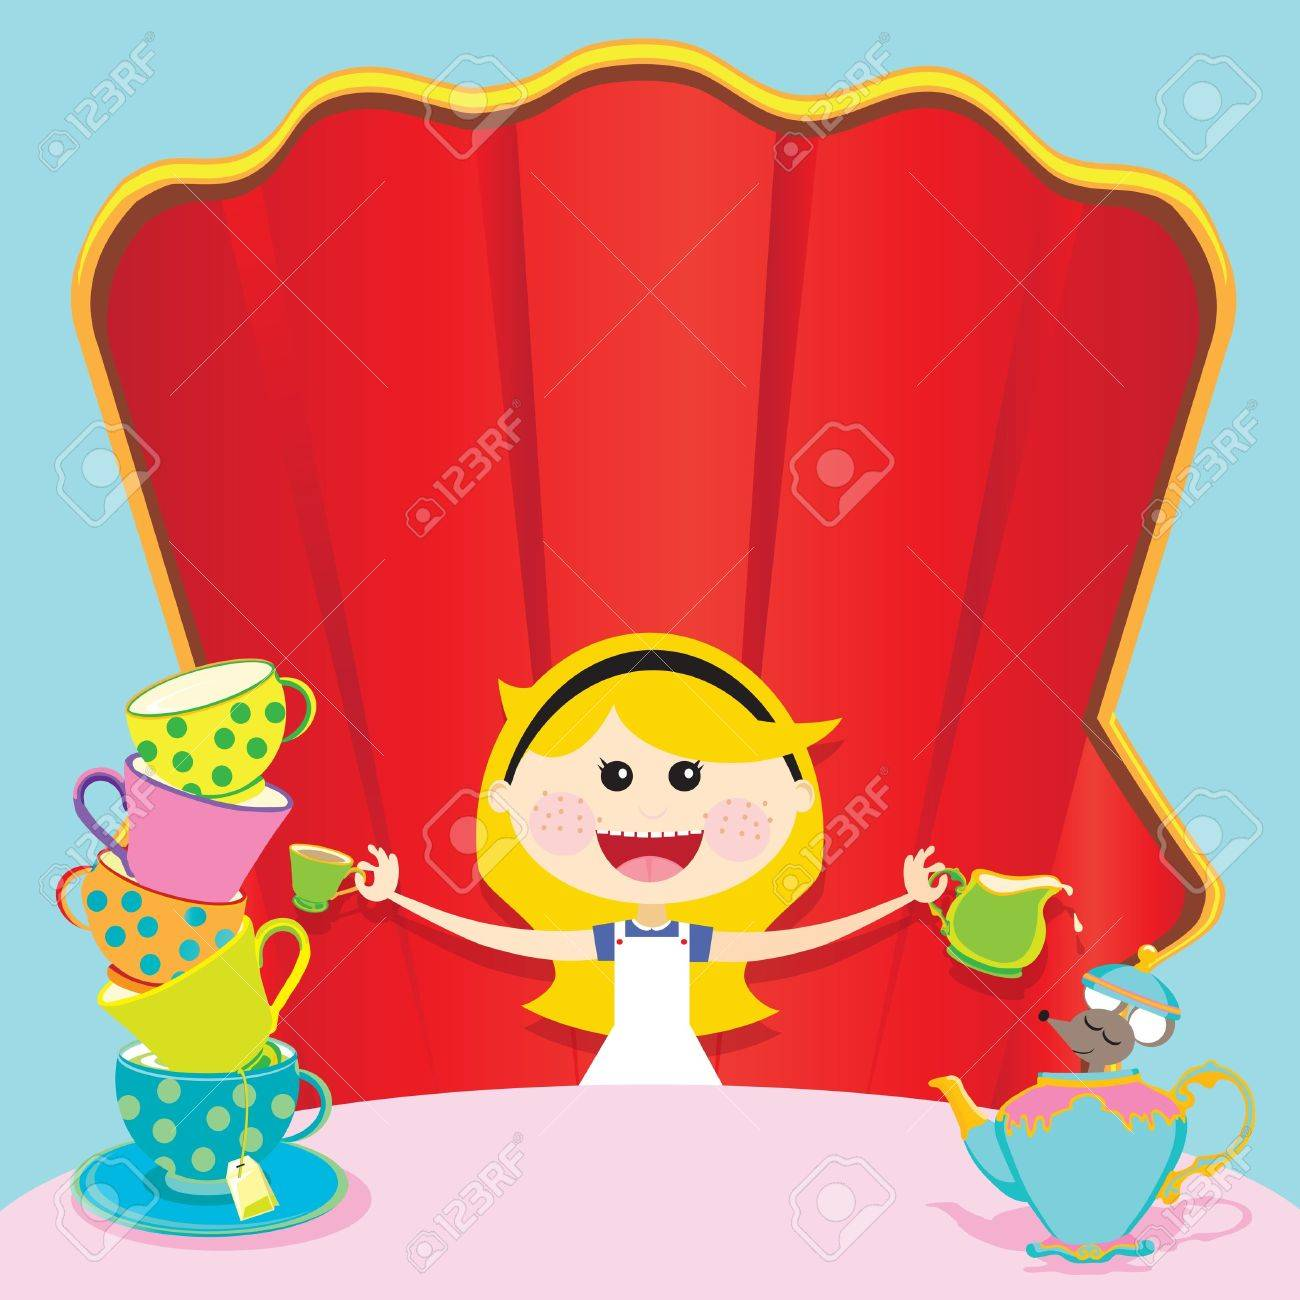 Alice In Wonderland Unbirthday Party Invitation Royalty Free